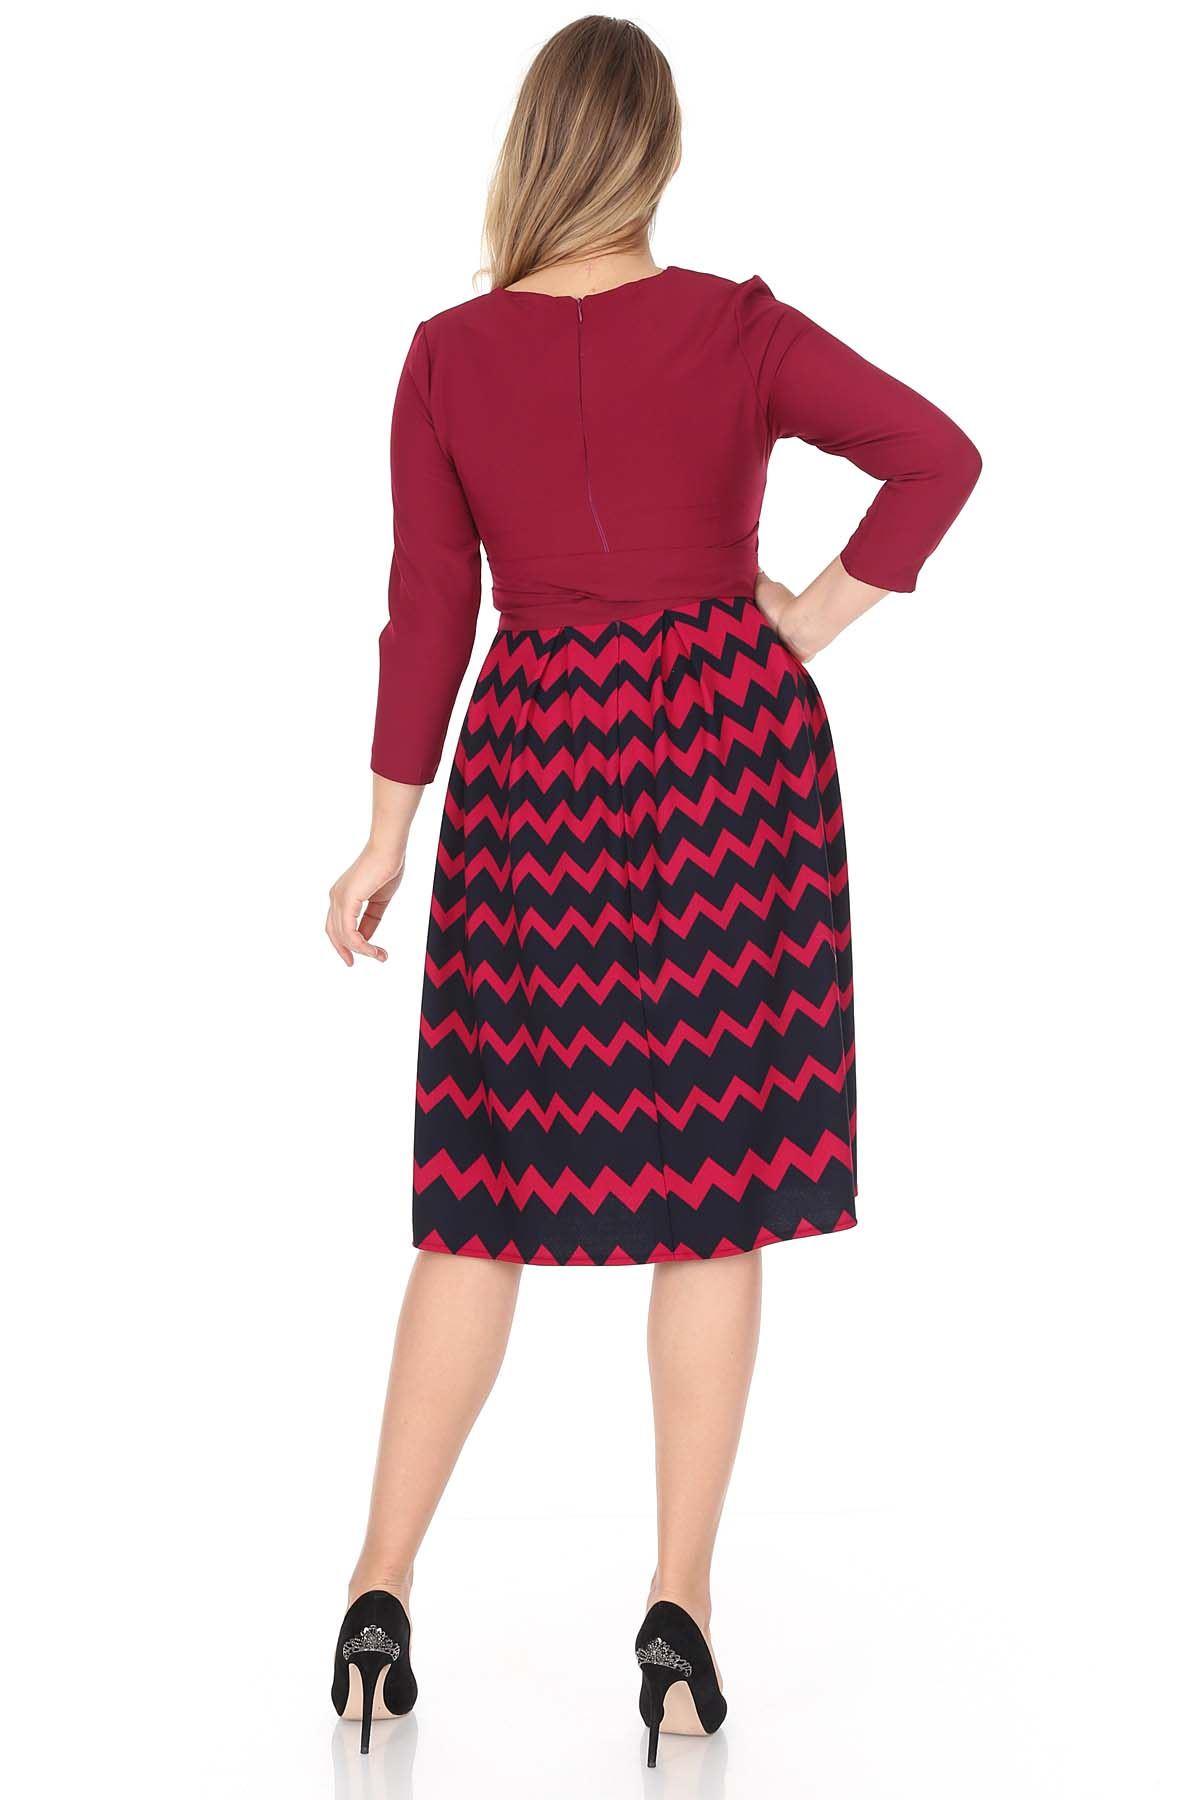 Zigzag Desen Kloş Büyük Beden Elbise 20C-0945